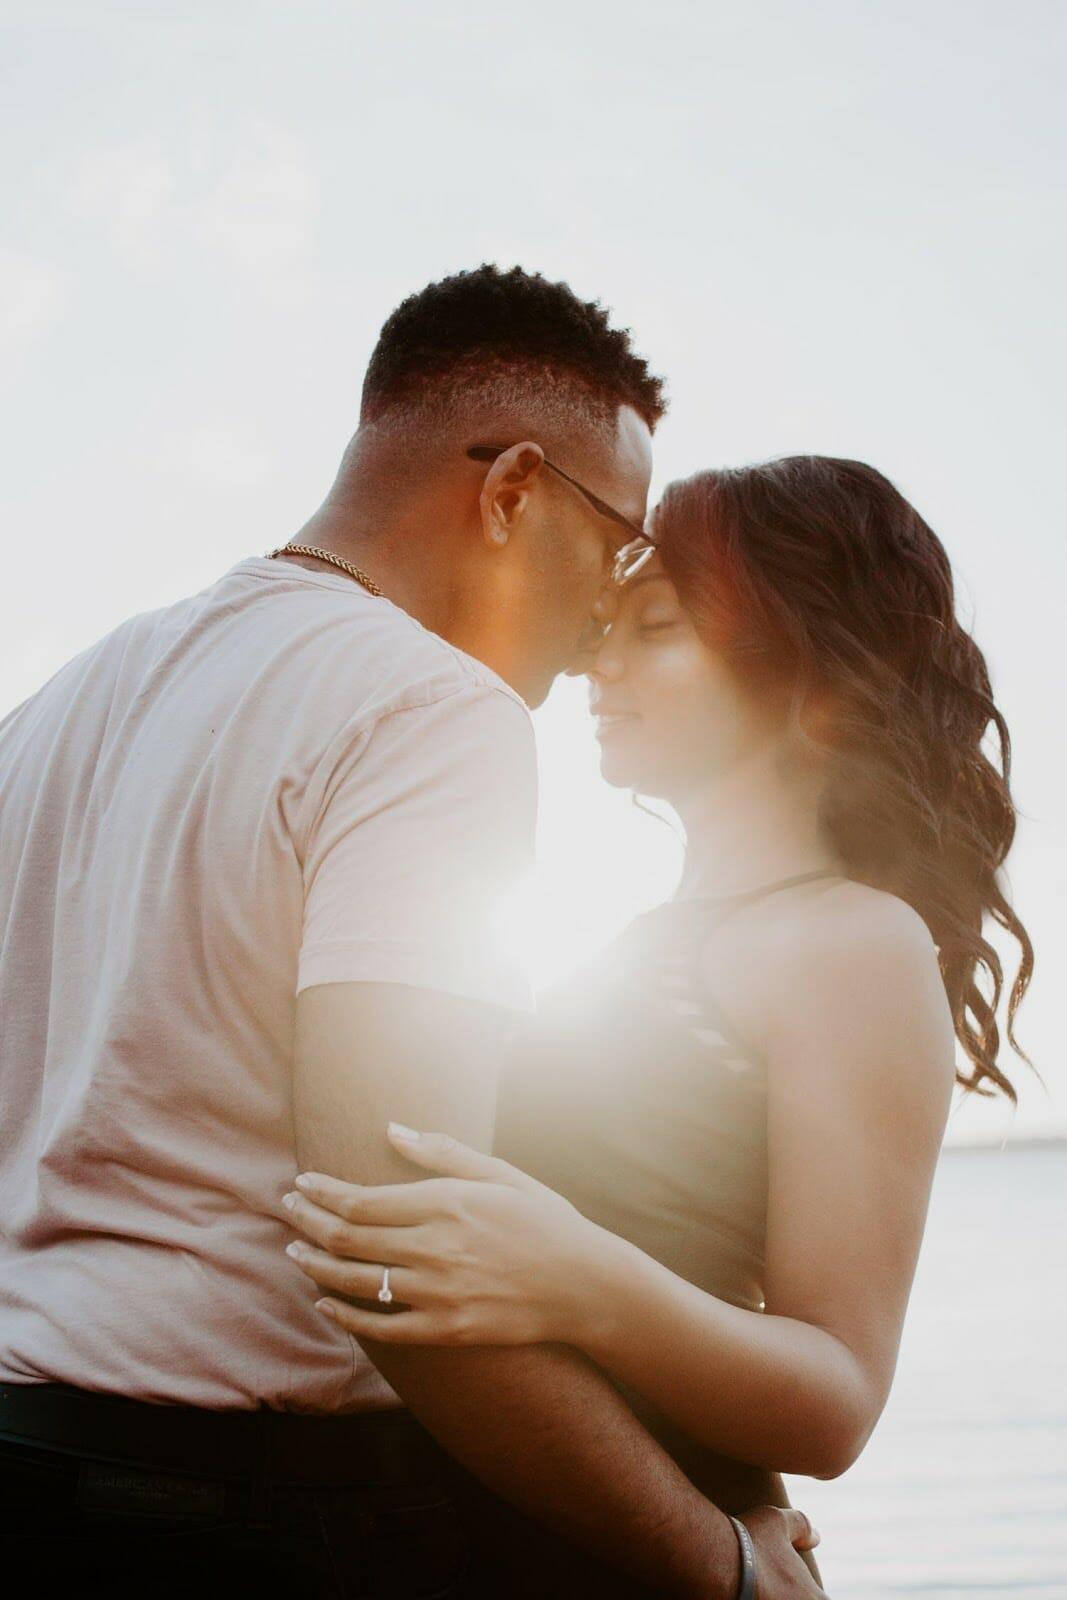 Gay dating website lexington park maryland